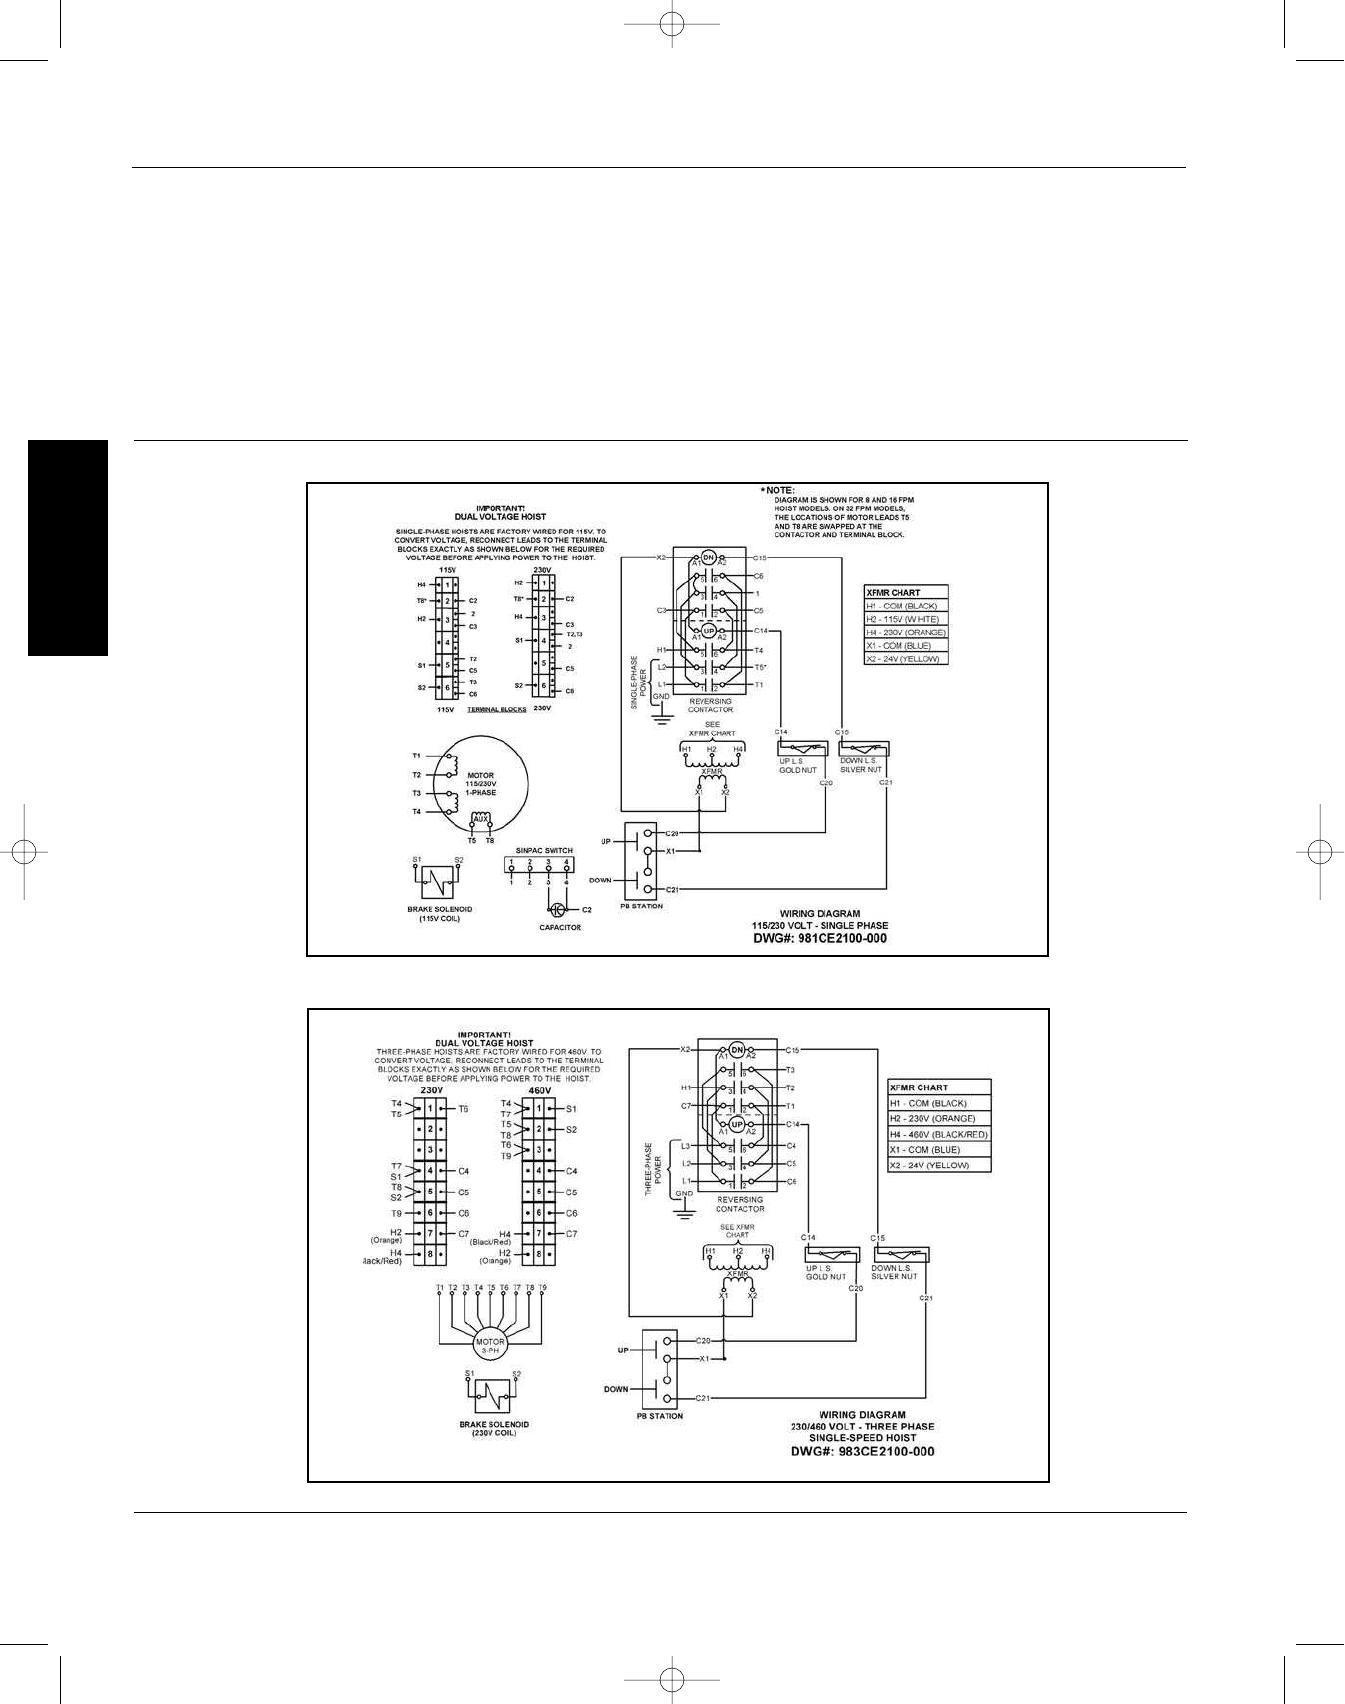 hight resolution of dayton 3yb72 3yb99 3ye10 3ye15 operating instructions and parts manual page 14